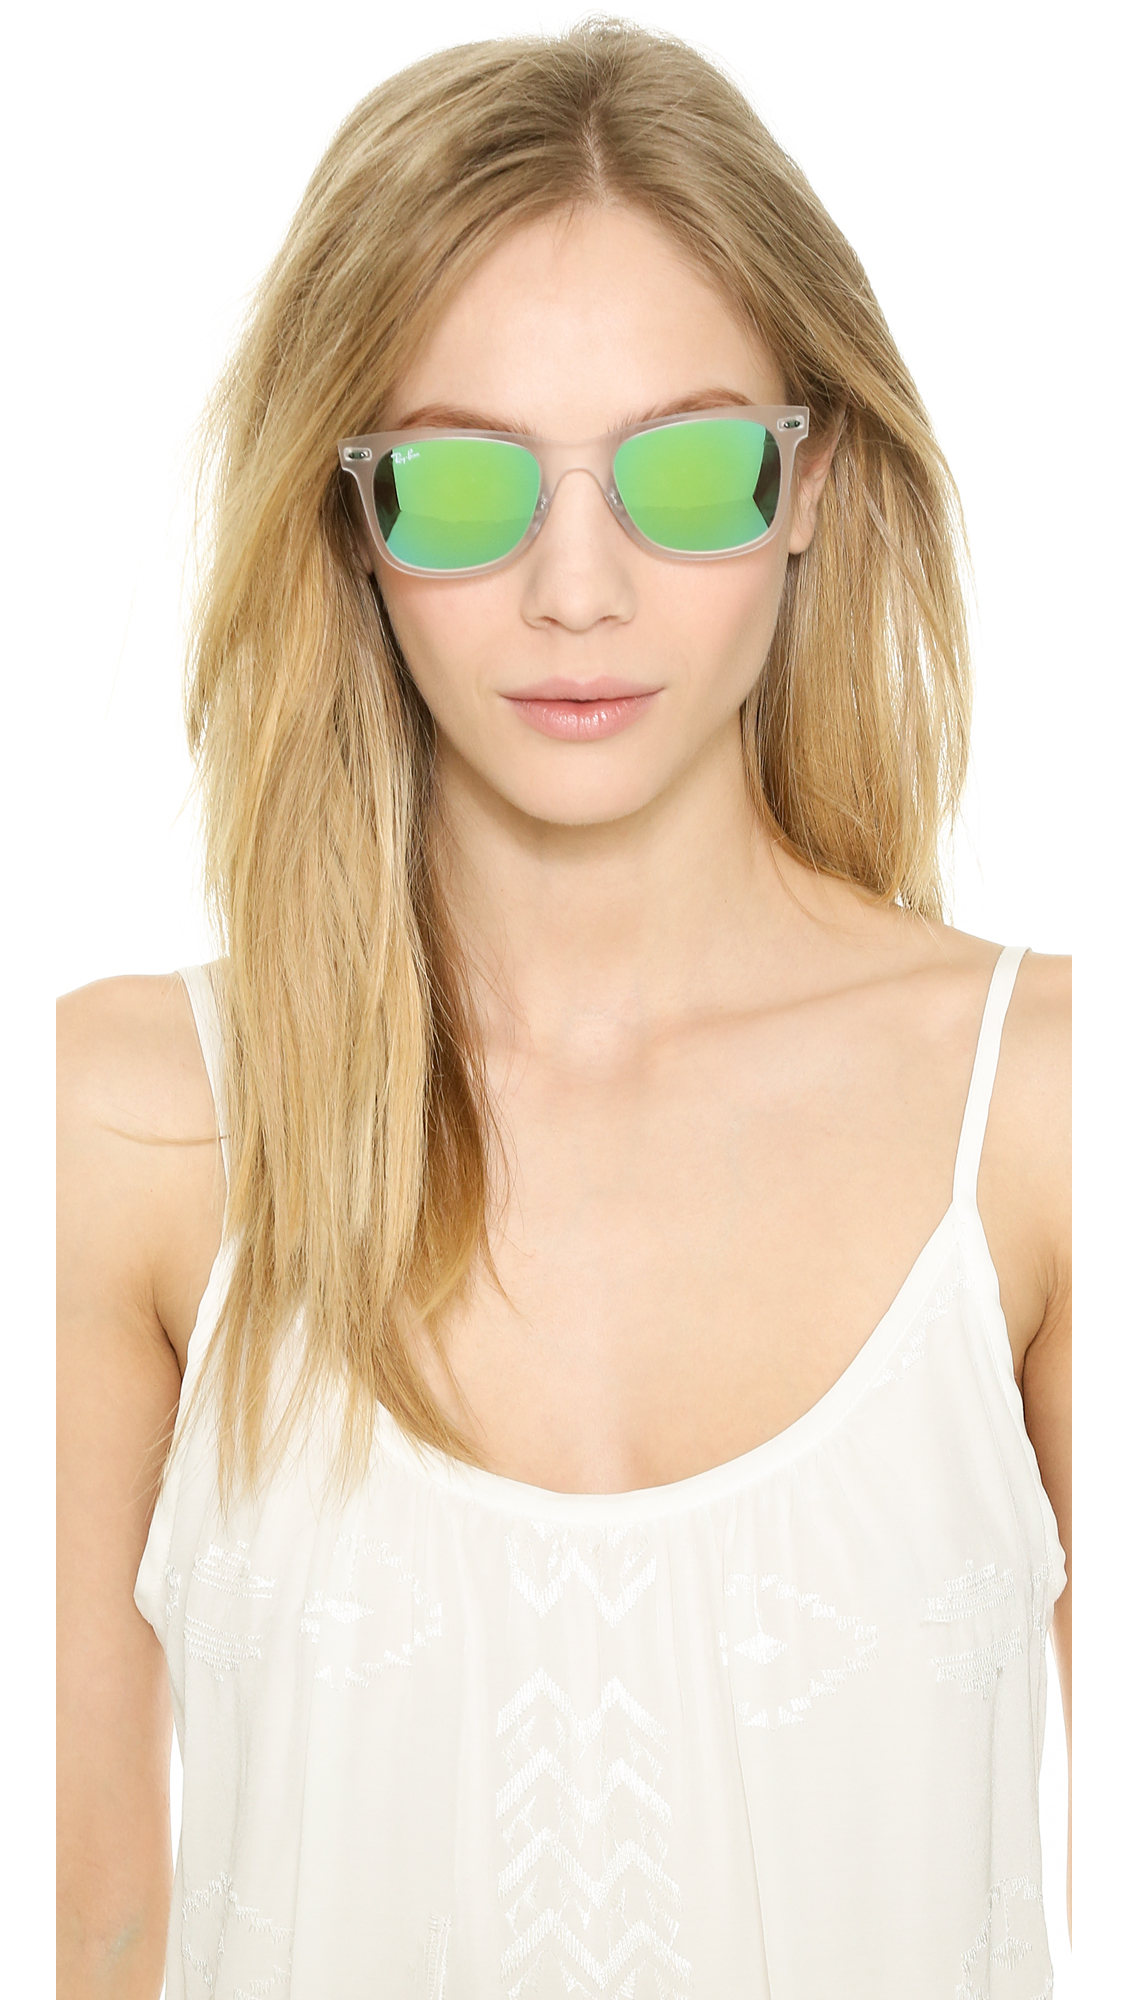 a88f459b9 ... 50% off lyst ray ban tech light sunglasses matte transparent green  mirror 53ead 95551